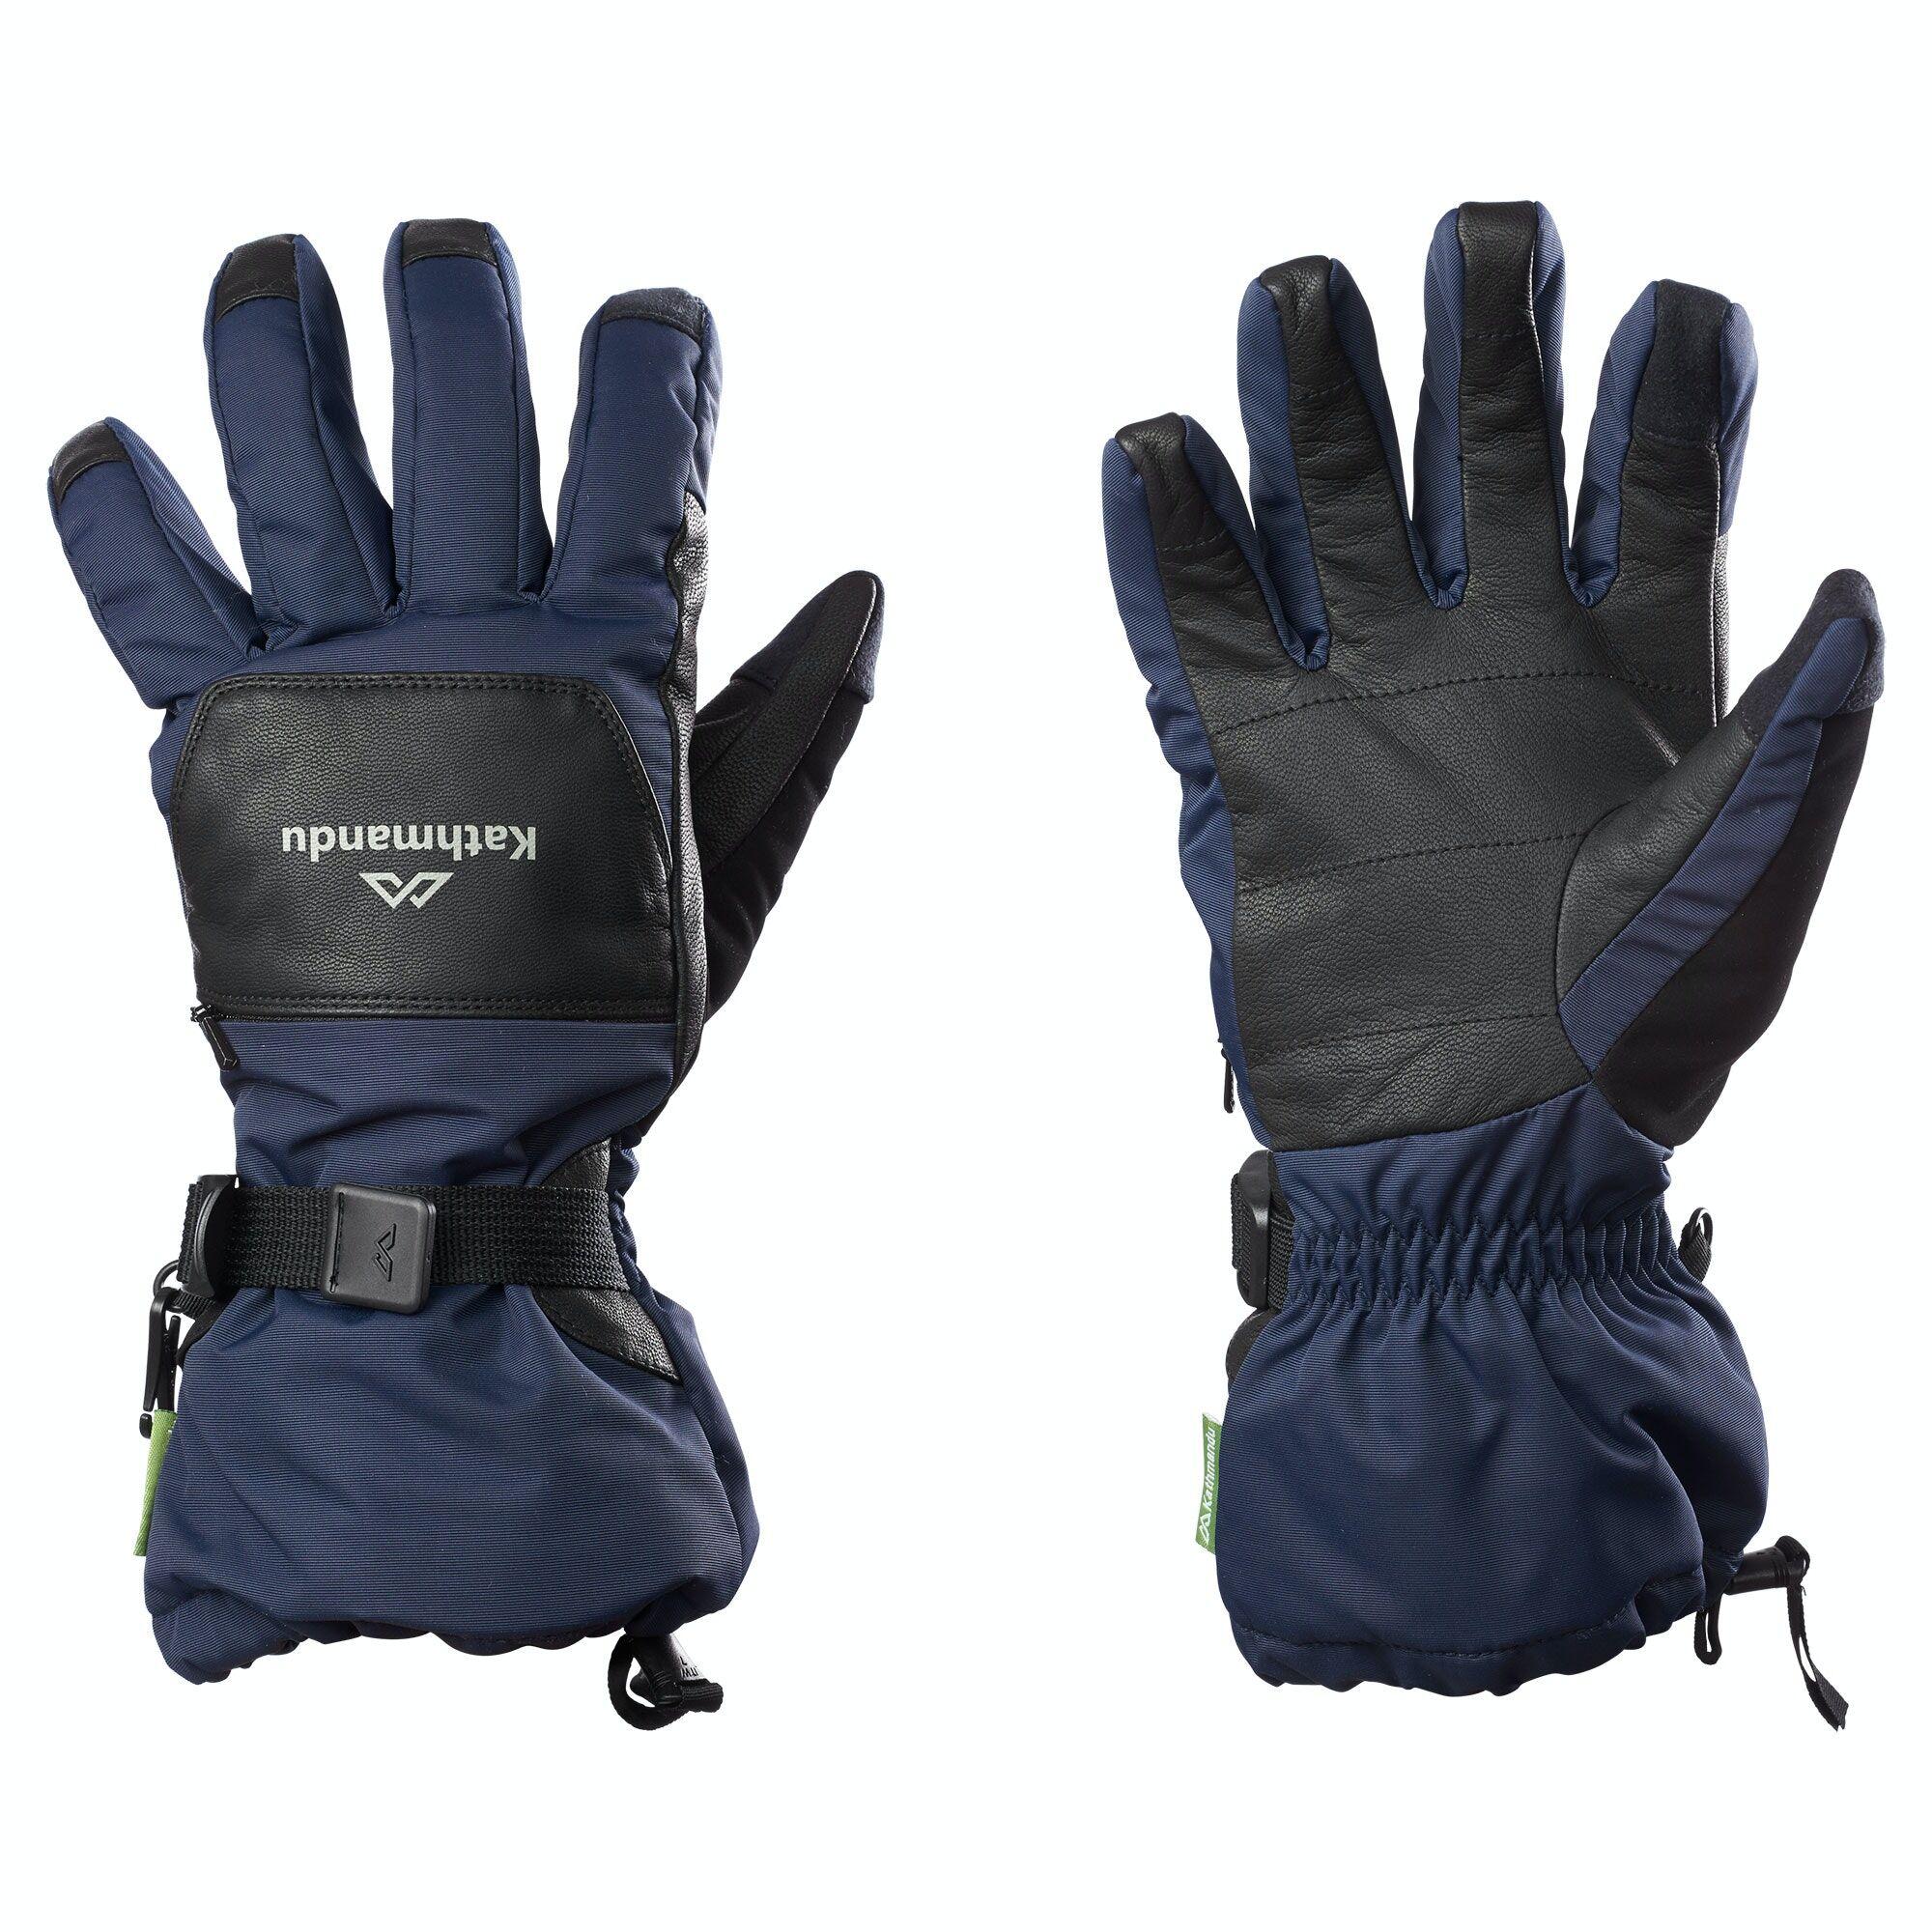 Kathmandu Snow Sports Gloves  - Dark Navy - Size: Extra Small